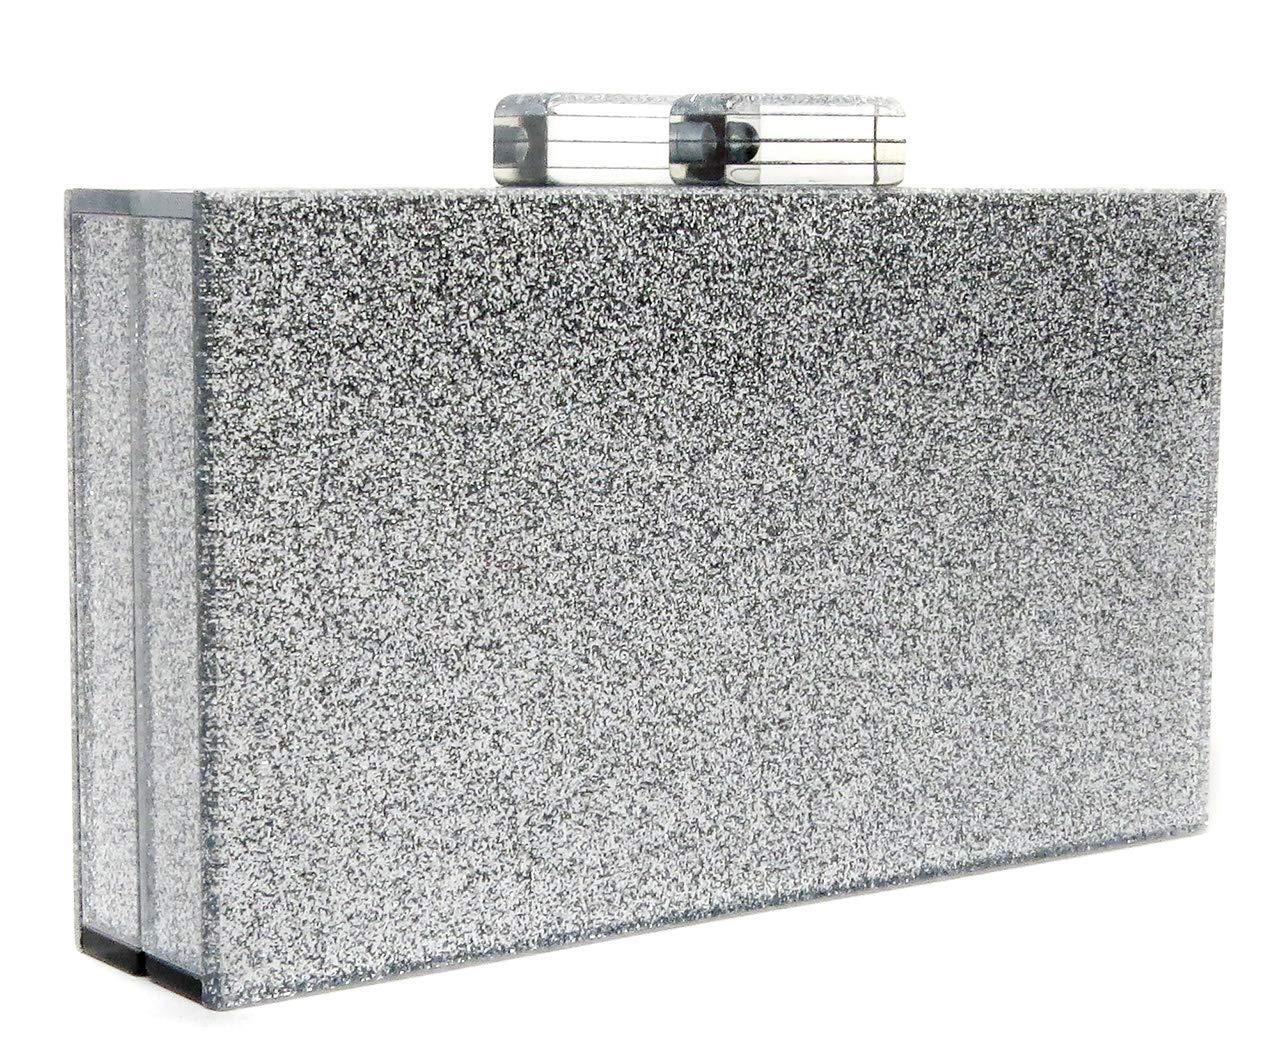 BG-713-G01 Box Clutch Chain Hard Case Crossbody Purse Evening Bag-Silver Glitter